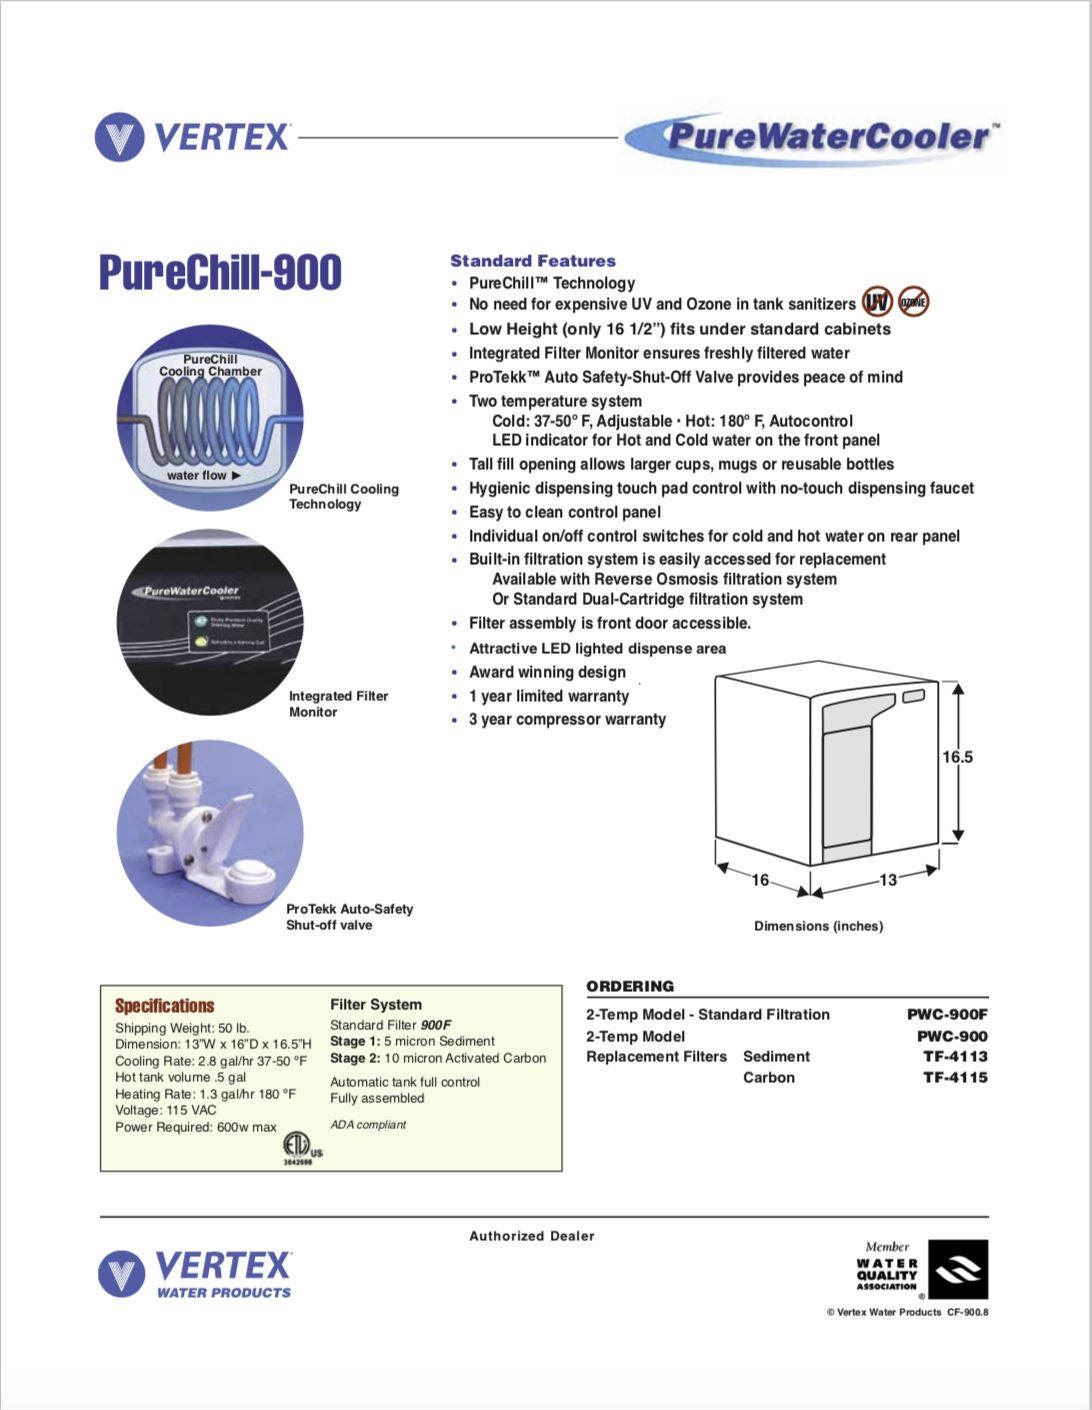 PureChill-900